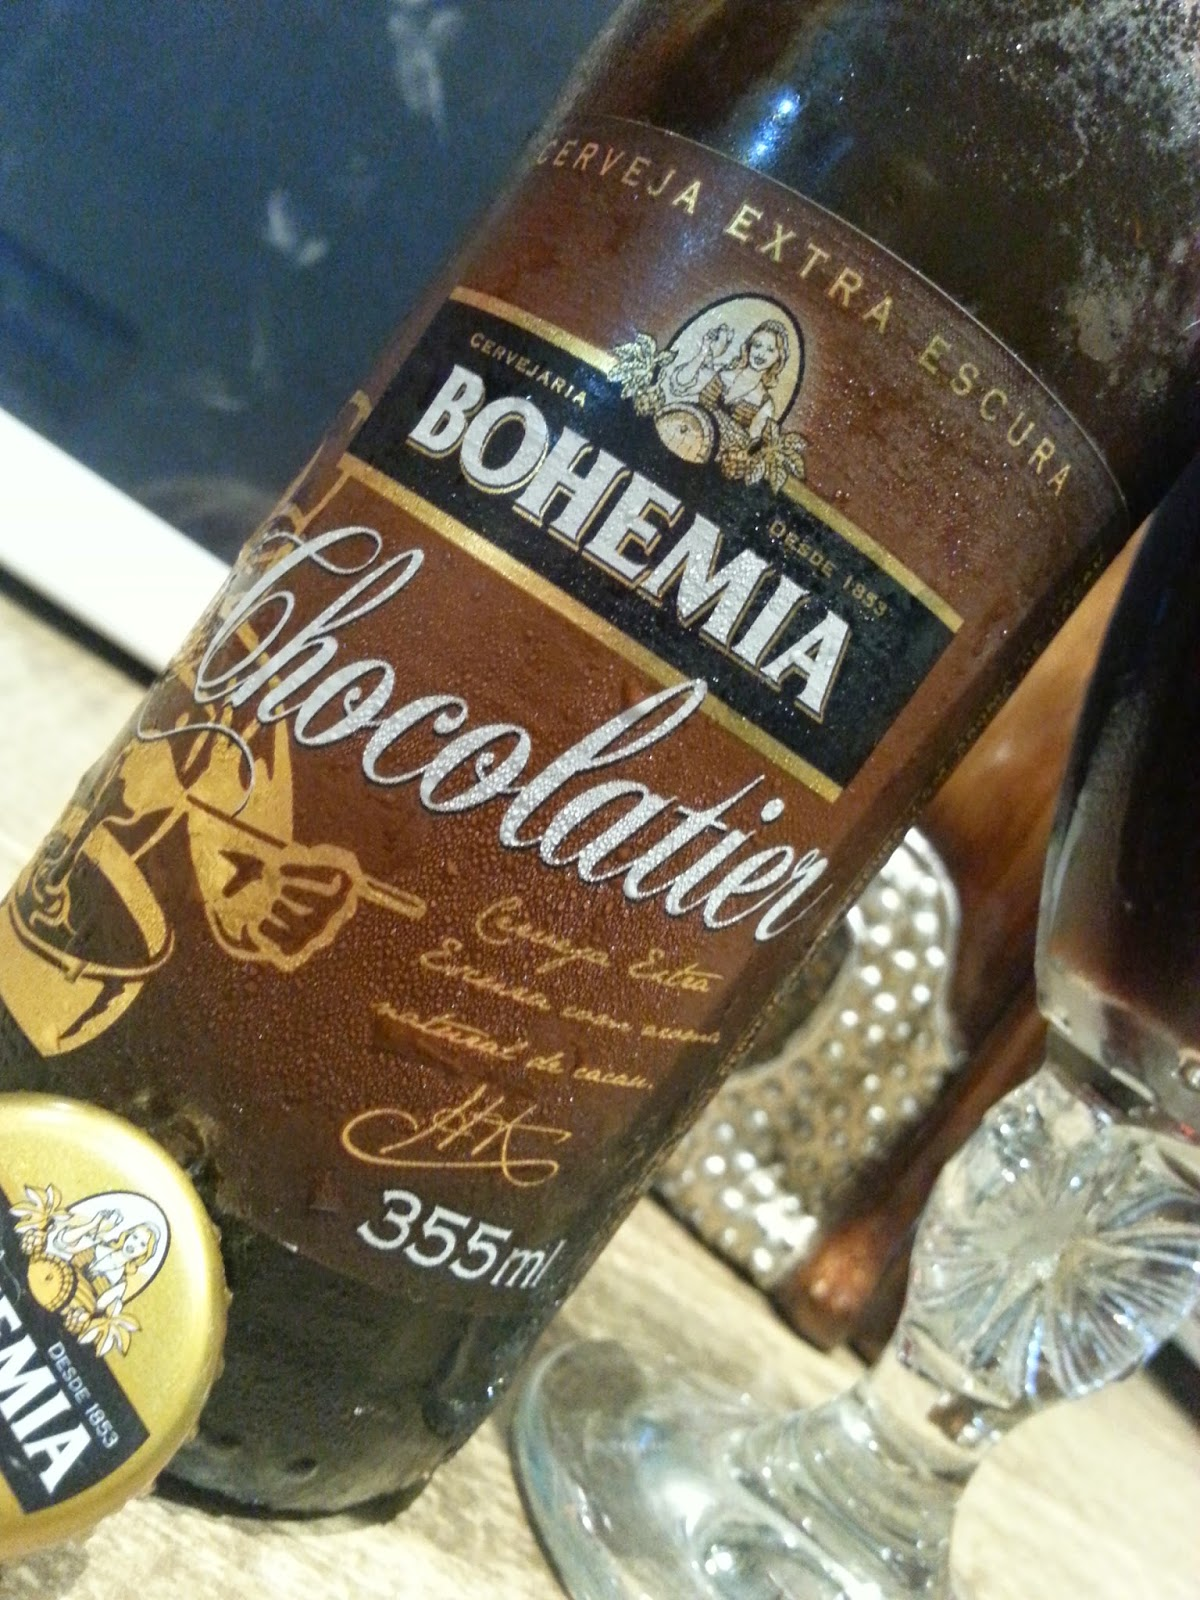 Bohemia Chocolatier